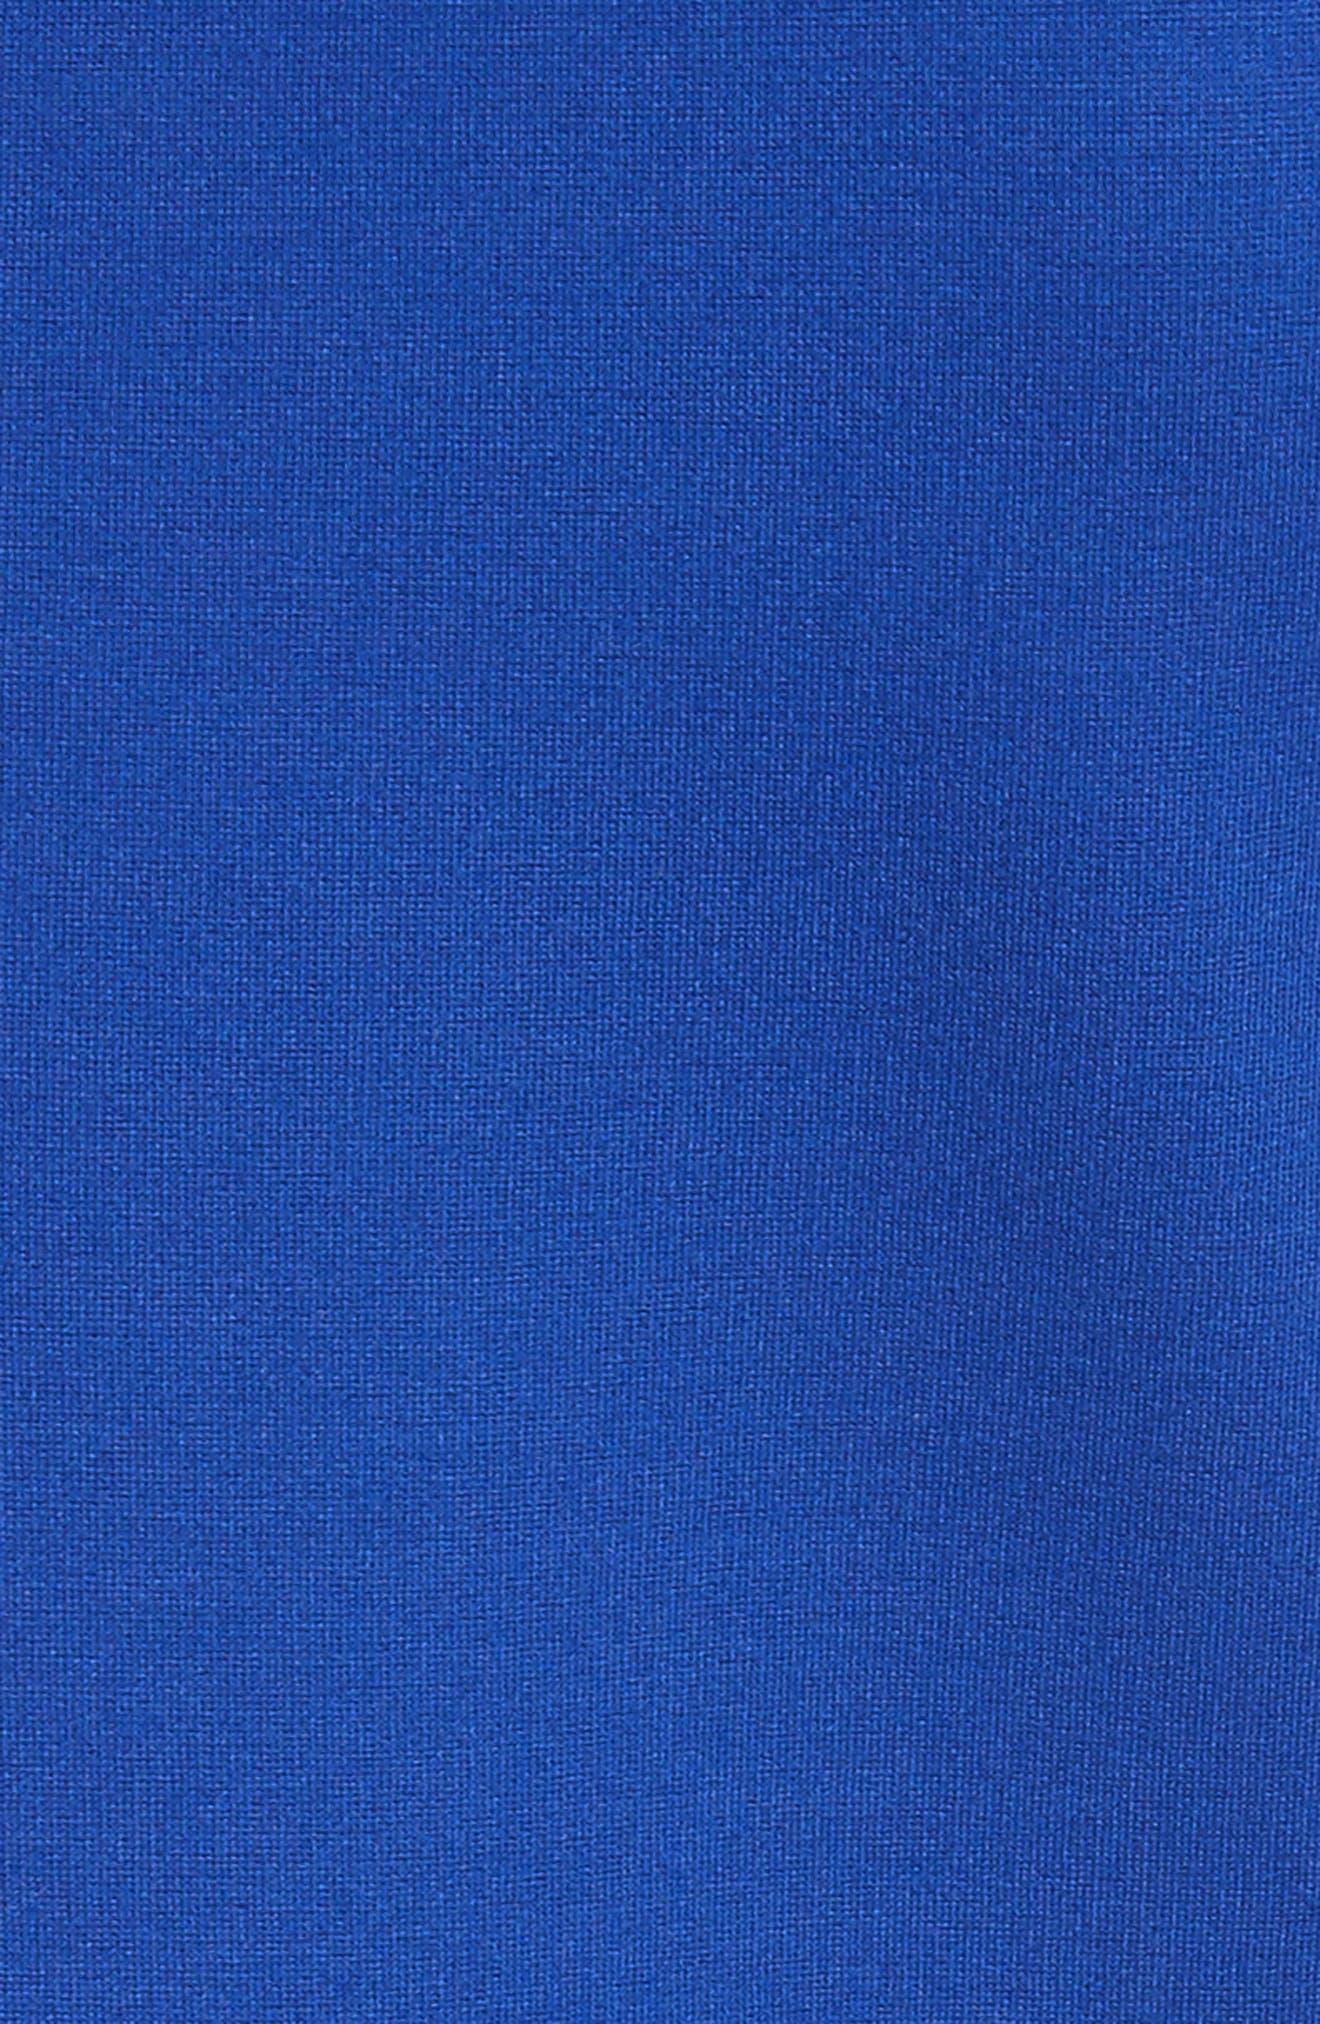 Codi Embroidered Scallop A-Line Dress,                             Alternate thumbnail 5, color,                             Mid Blue